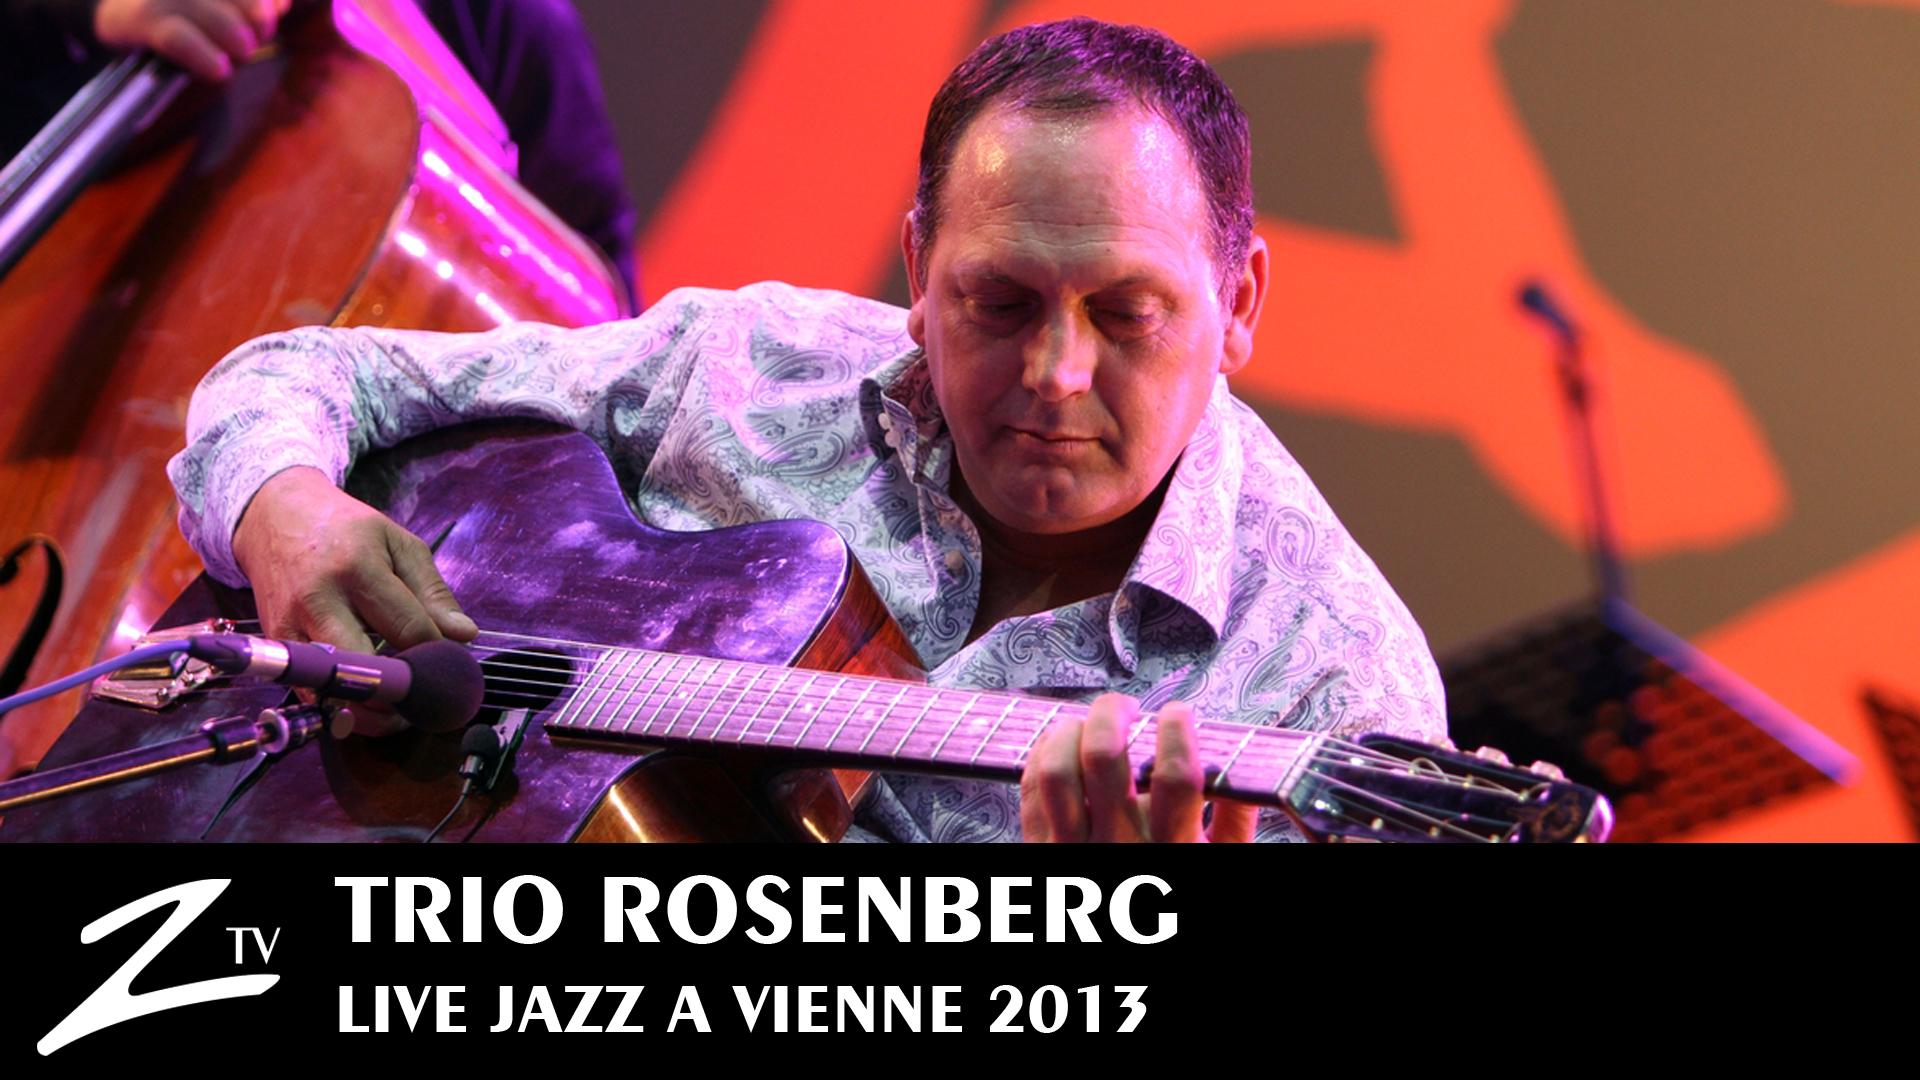 Trio Rosenberg